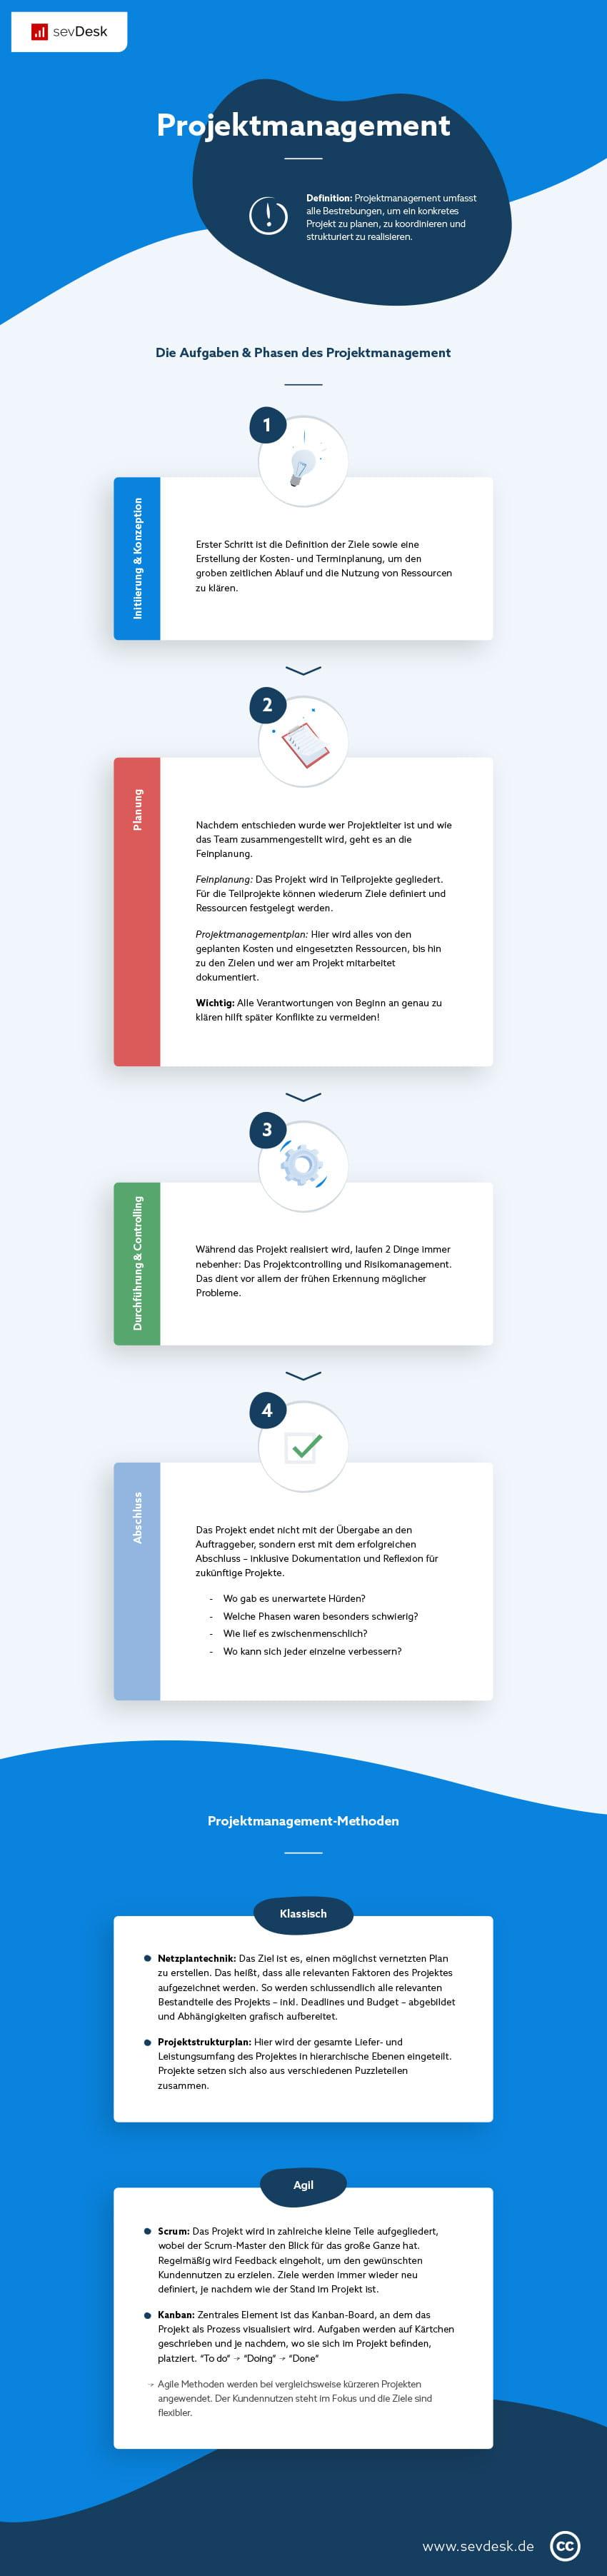 Große Infografik zum Projektmanagement